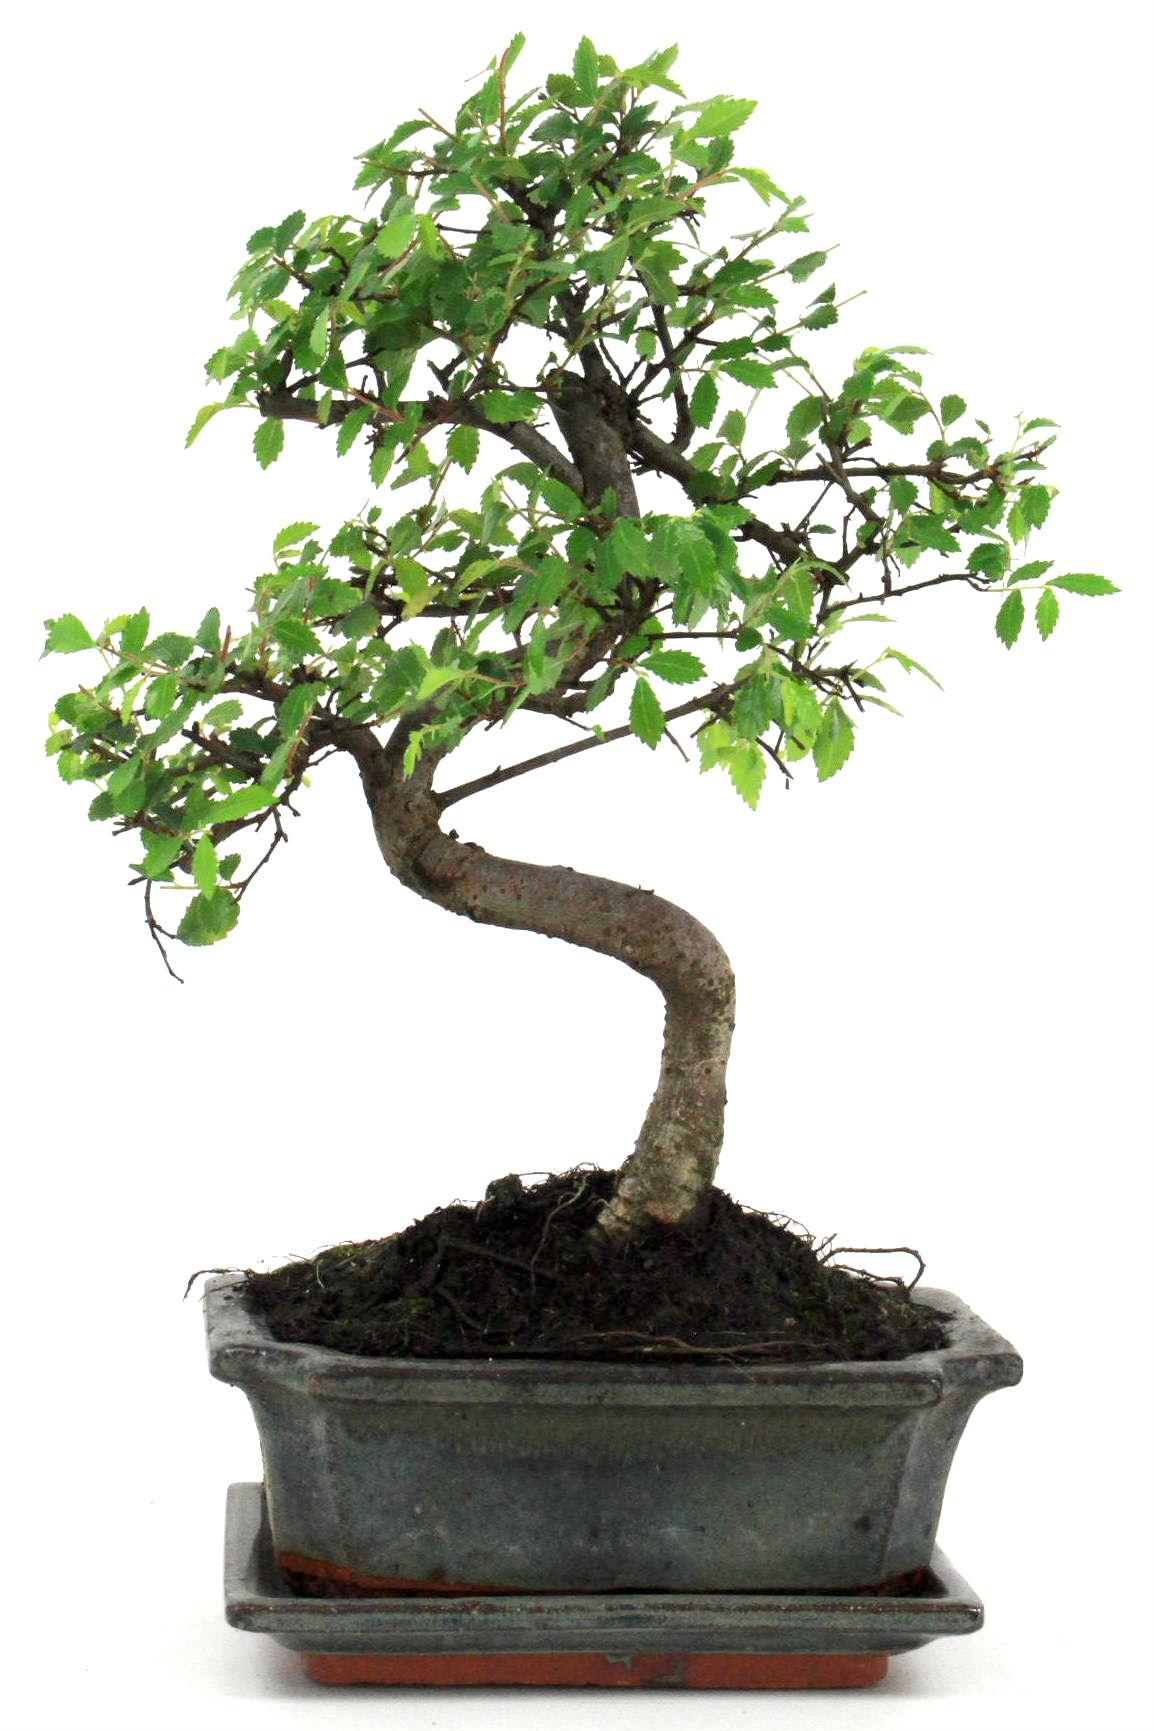 bonsai chinesische ulme 30 35 cm g168 bei oyaki bonsai kaufen. Black Bedroom Furniture Sets. Home Design Ideas